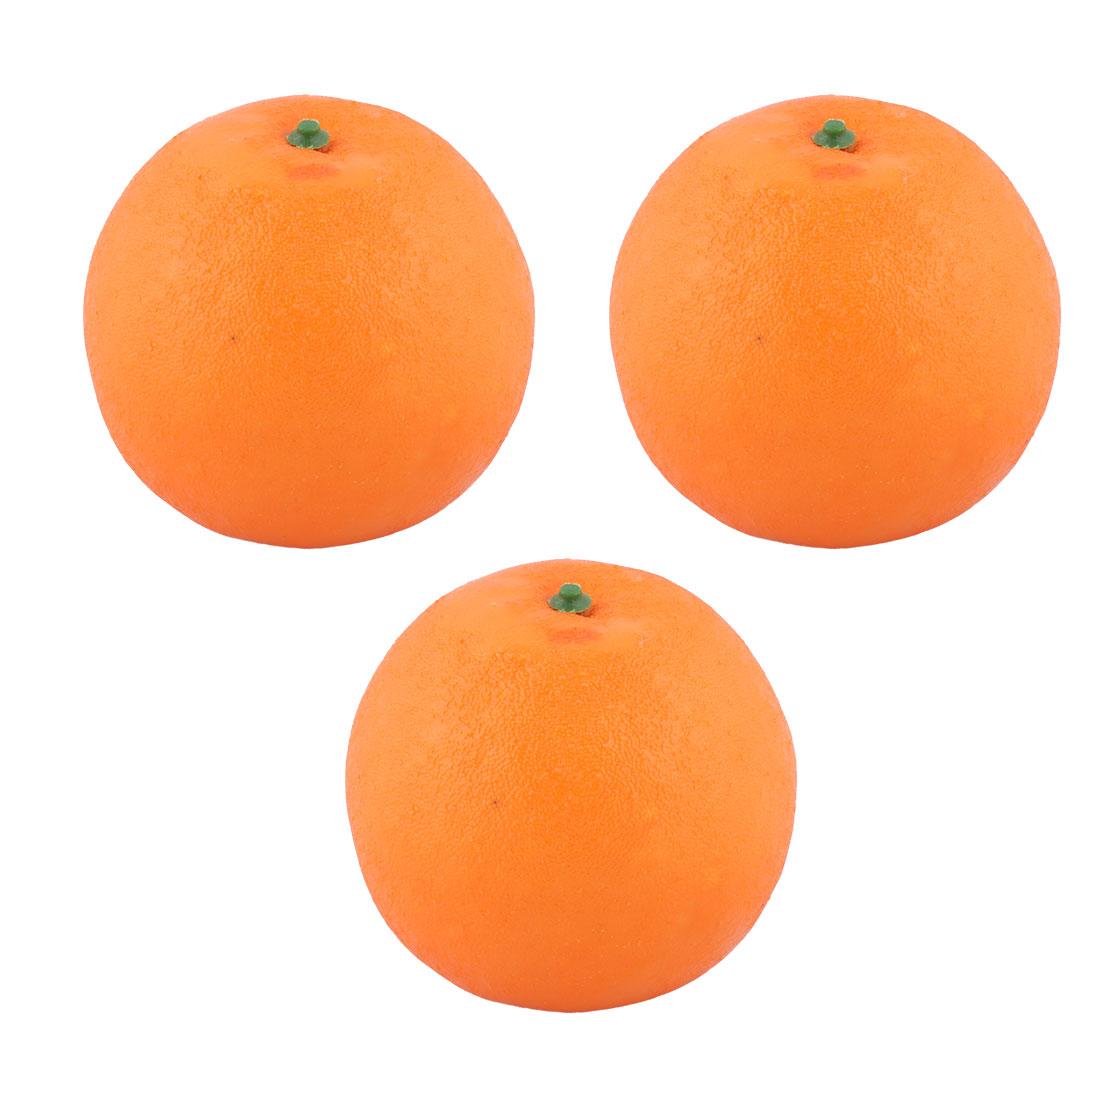 House Tea Table Decor Foam Artificial Orange Design Emulation Fruit Mold 3pcs